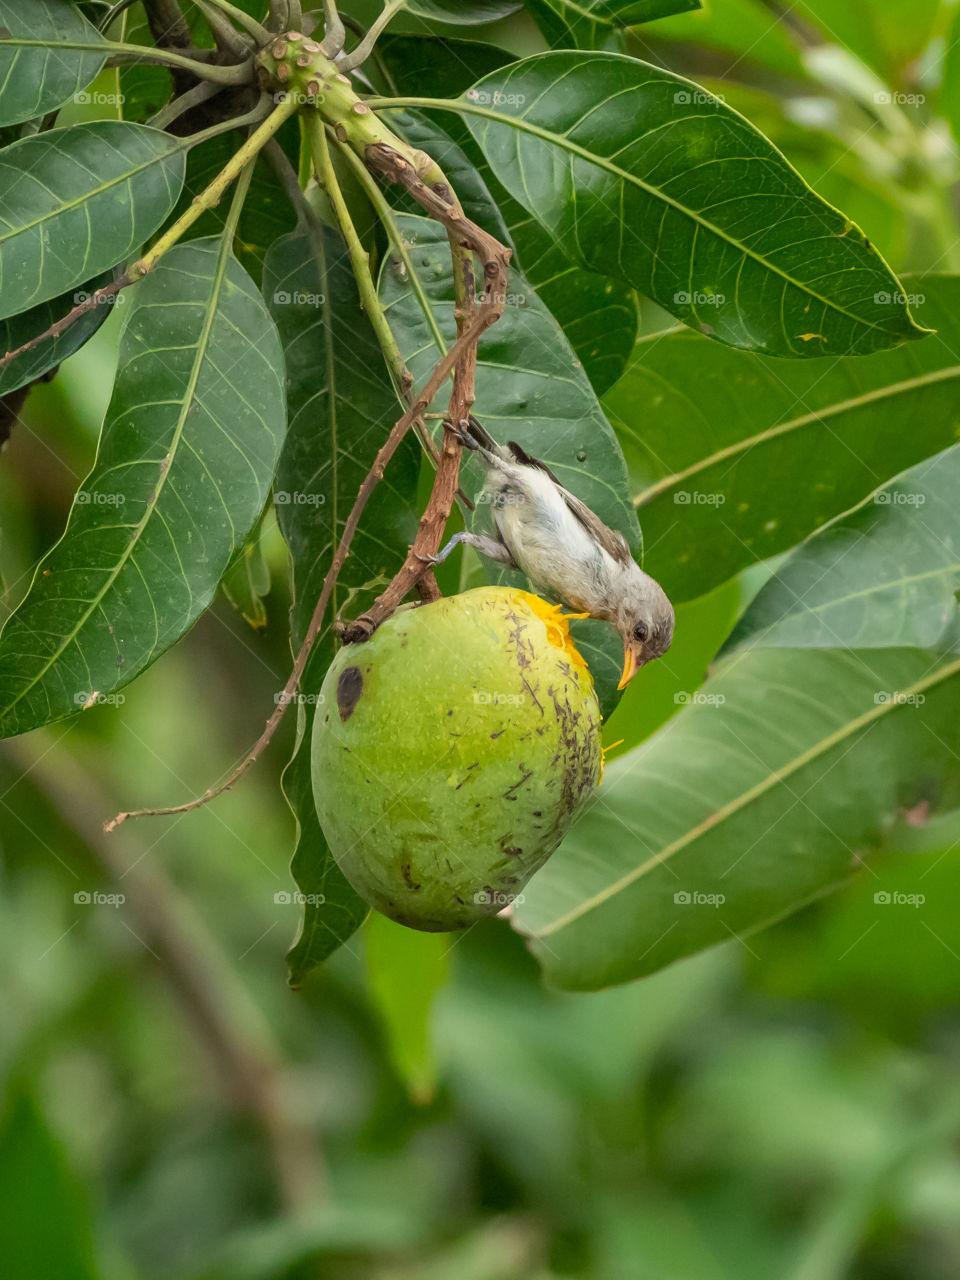 Little Bird is enjoying sweet mango